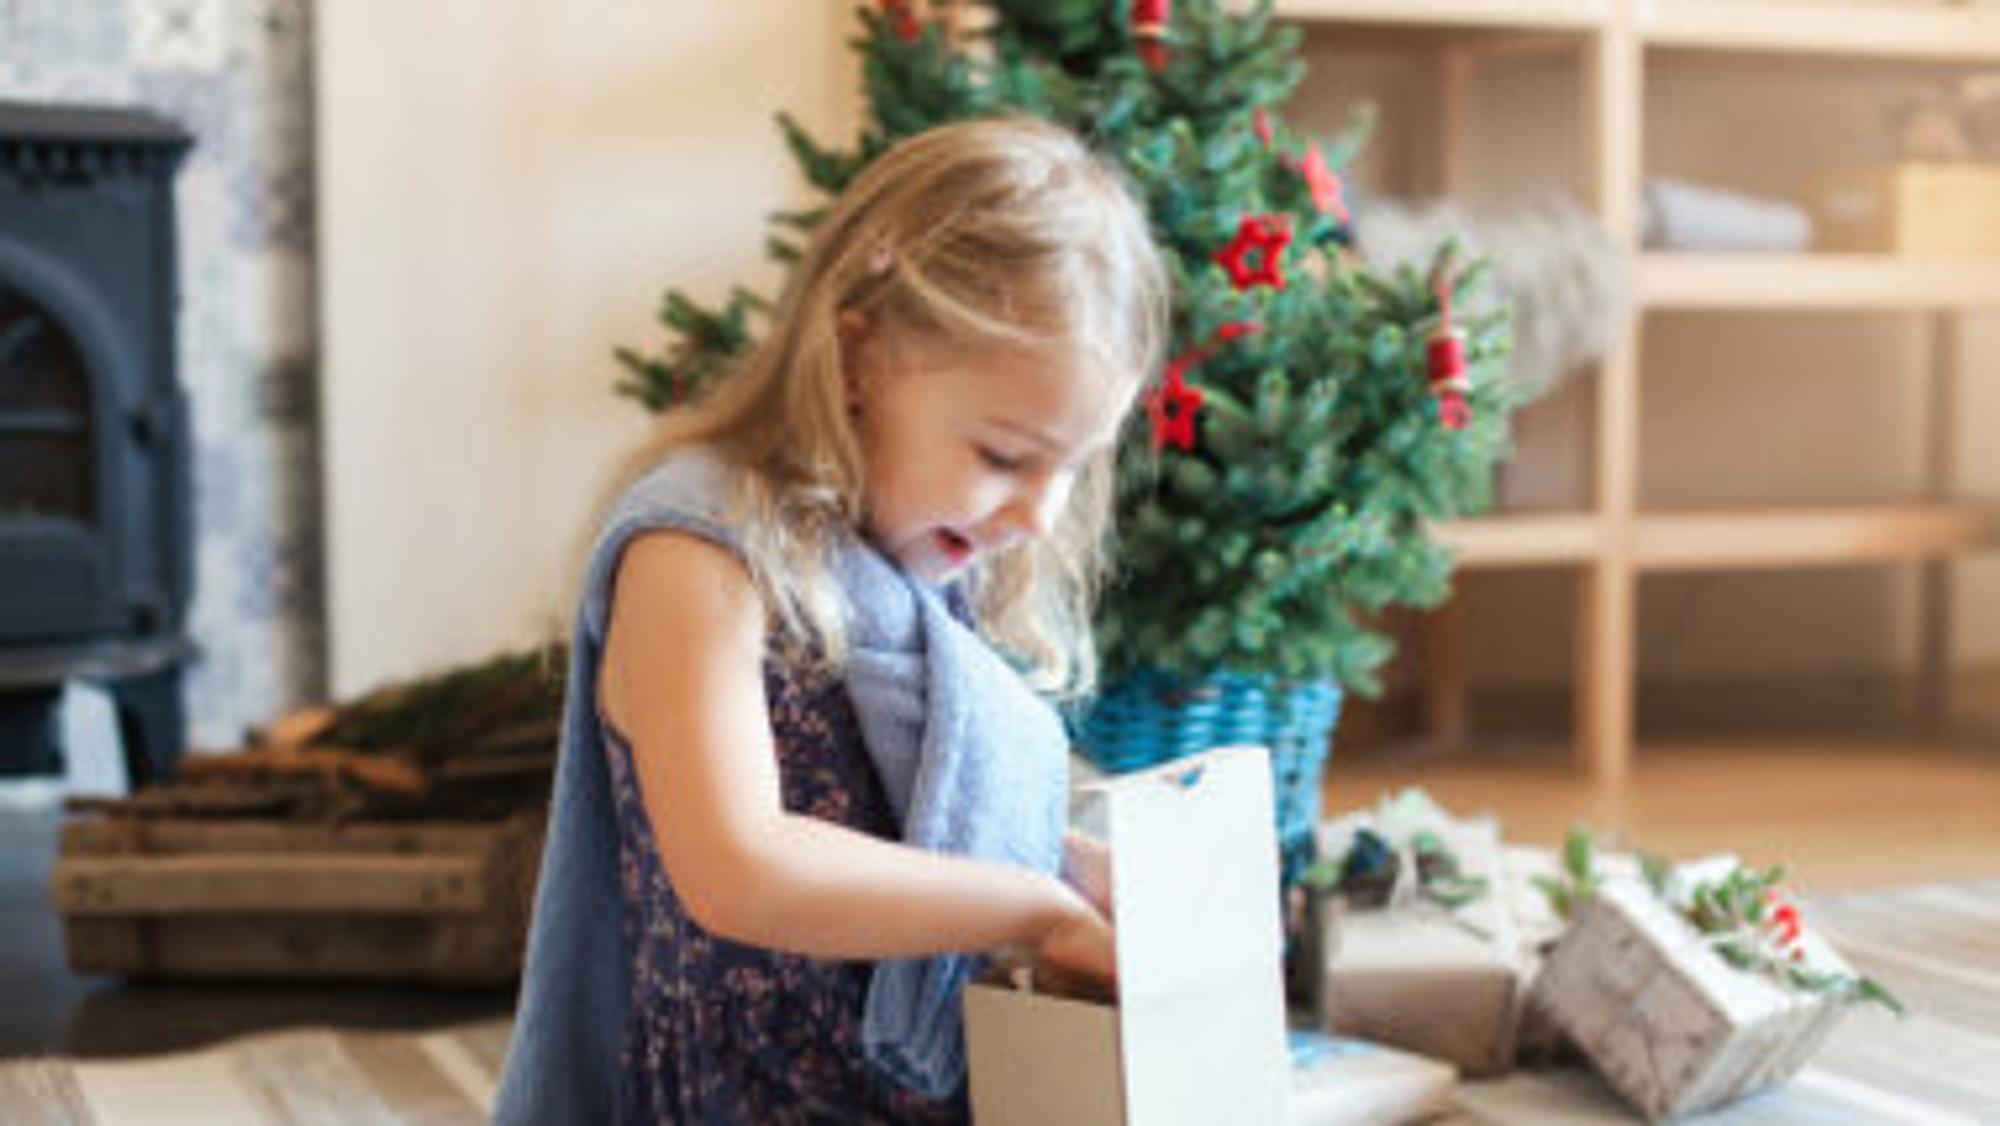 Kind öffnet Geschenk